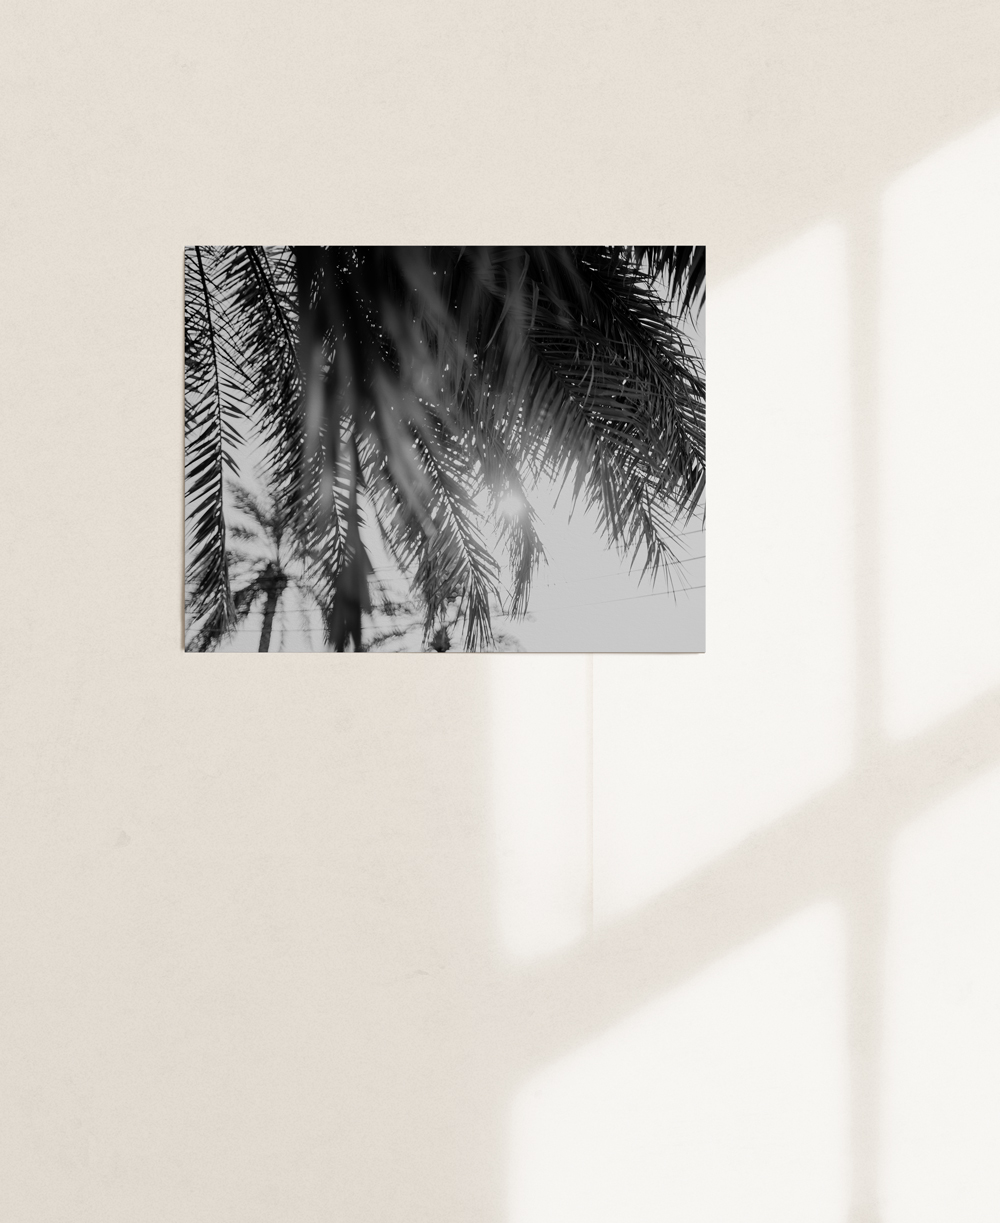 nicischwab-prints-02-018